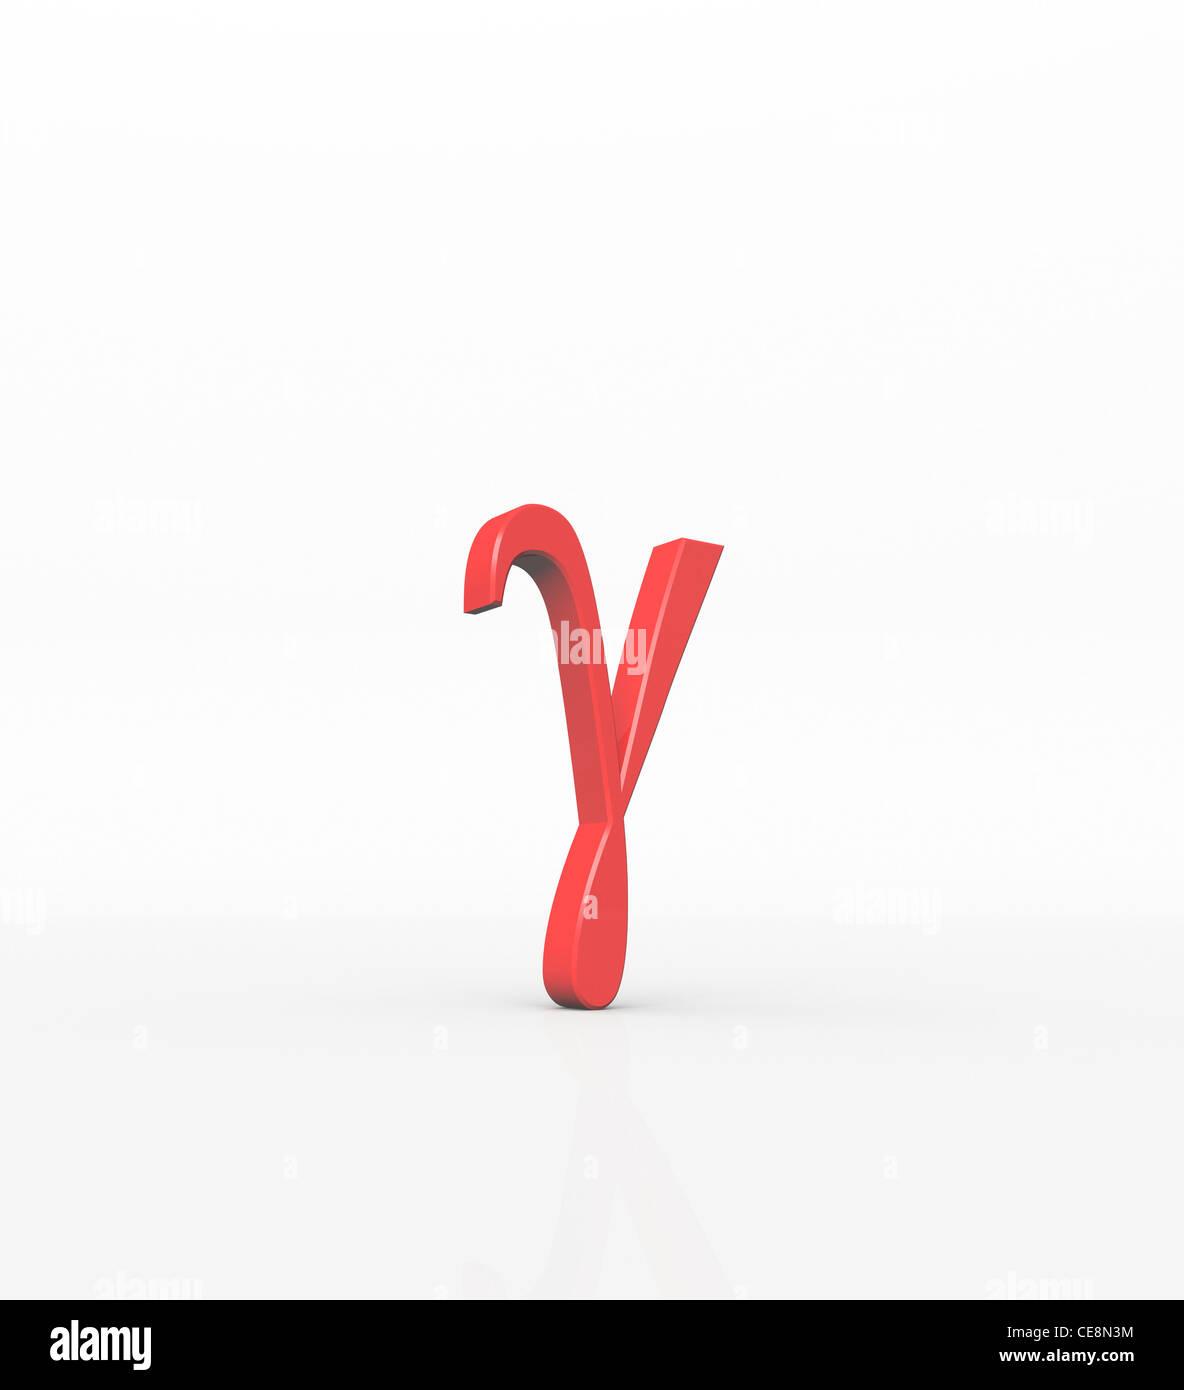 Gamma third letter Greek alphabet In system Greek numerals it value 3 lower-case letter